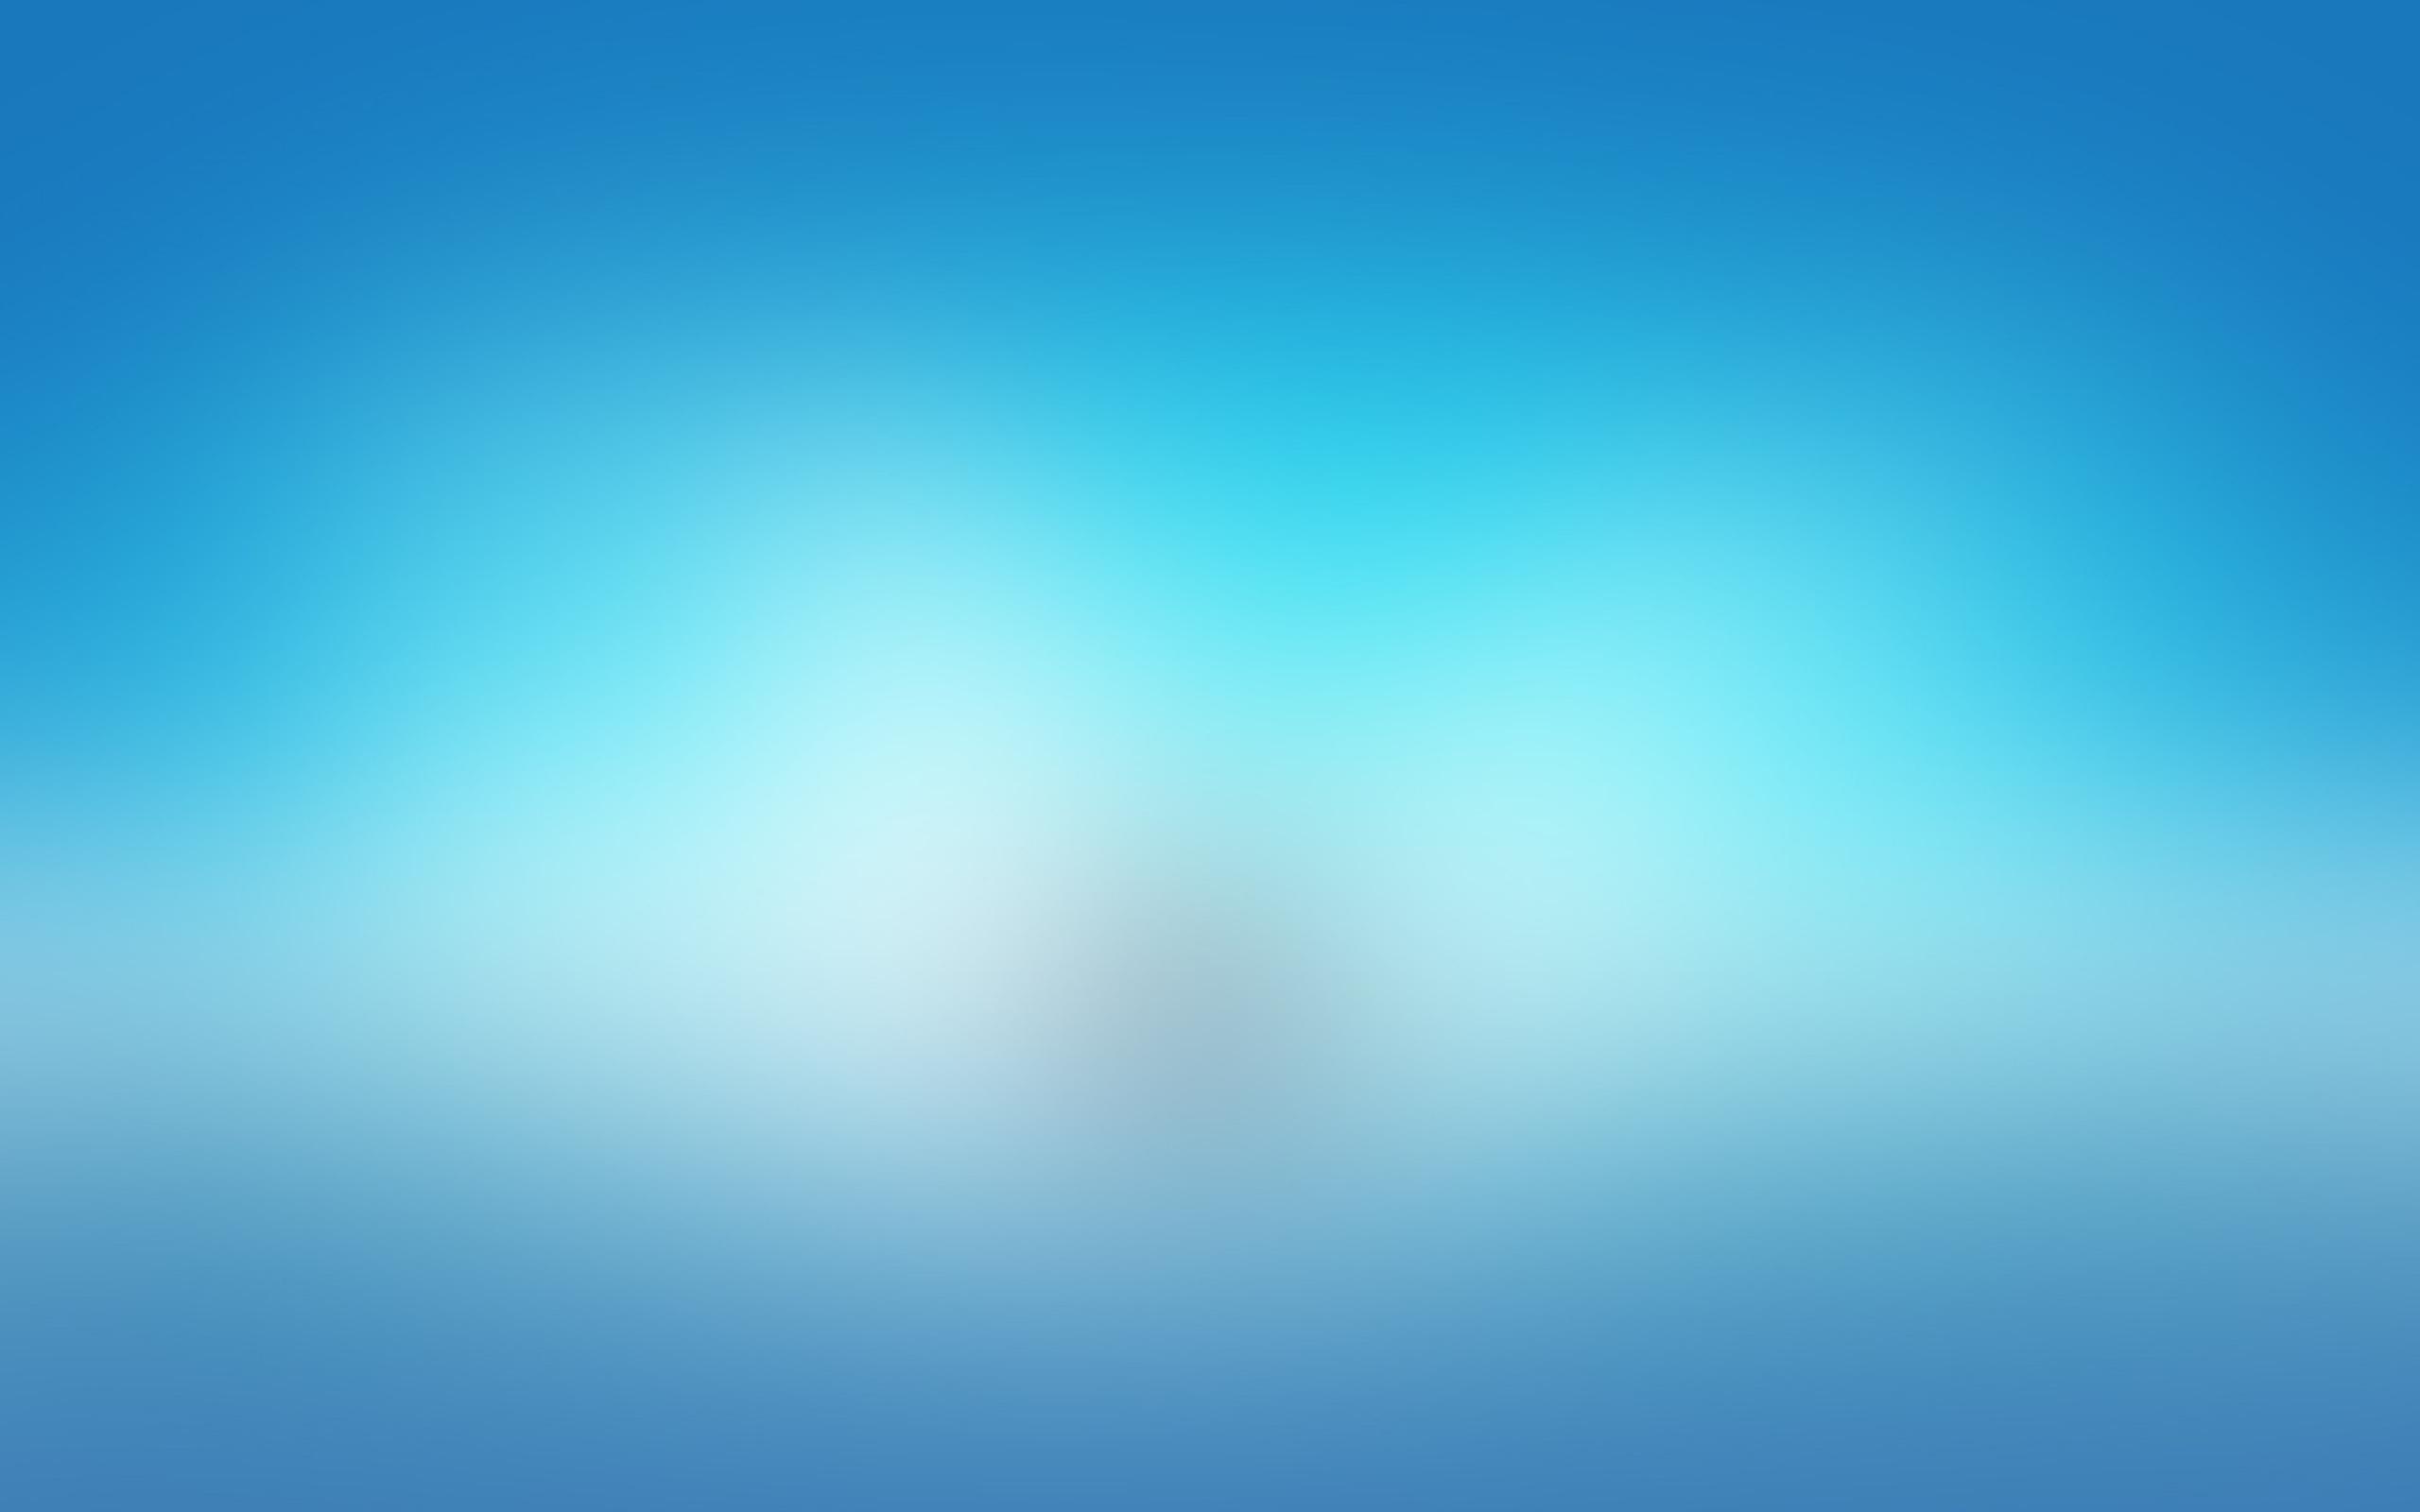 Nifty Fifty Blur HD Desktop Wallpaper for K Ultra HD TV